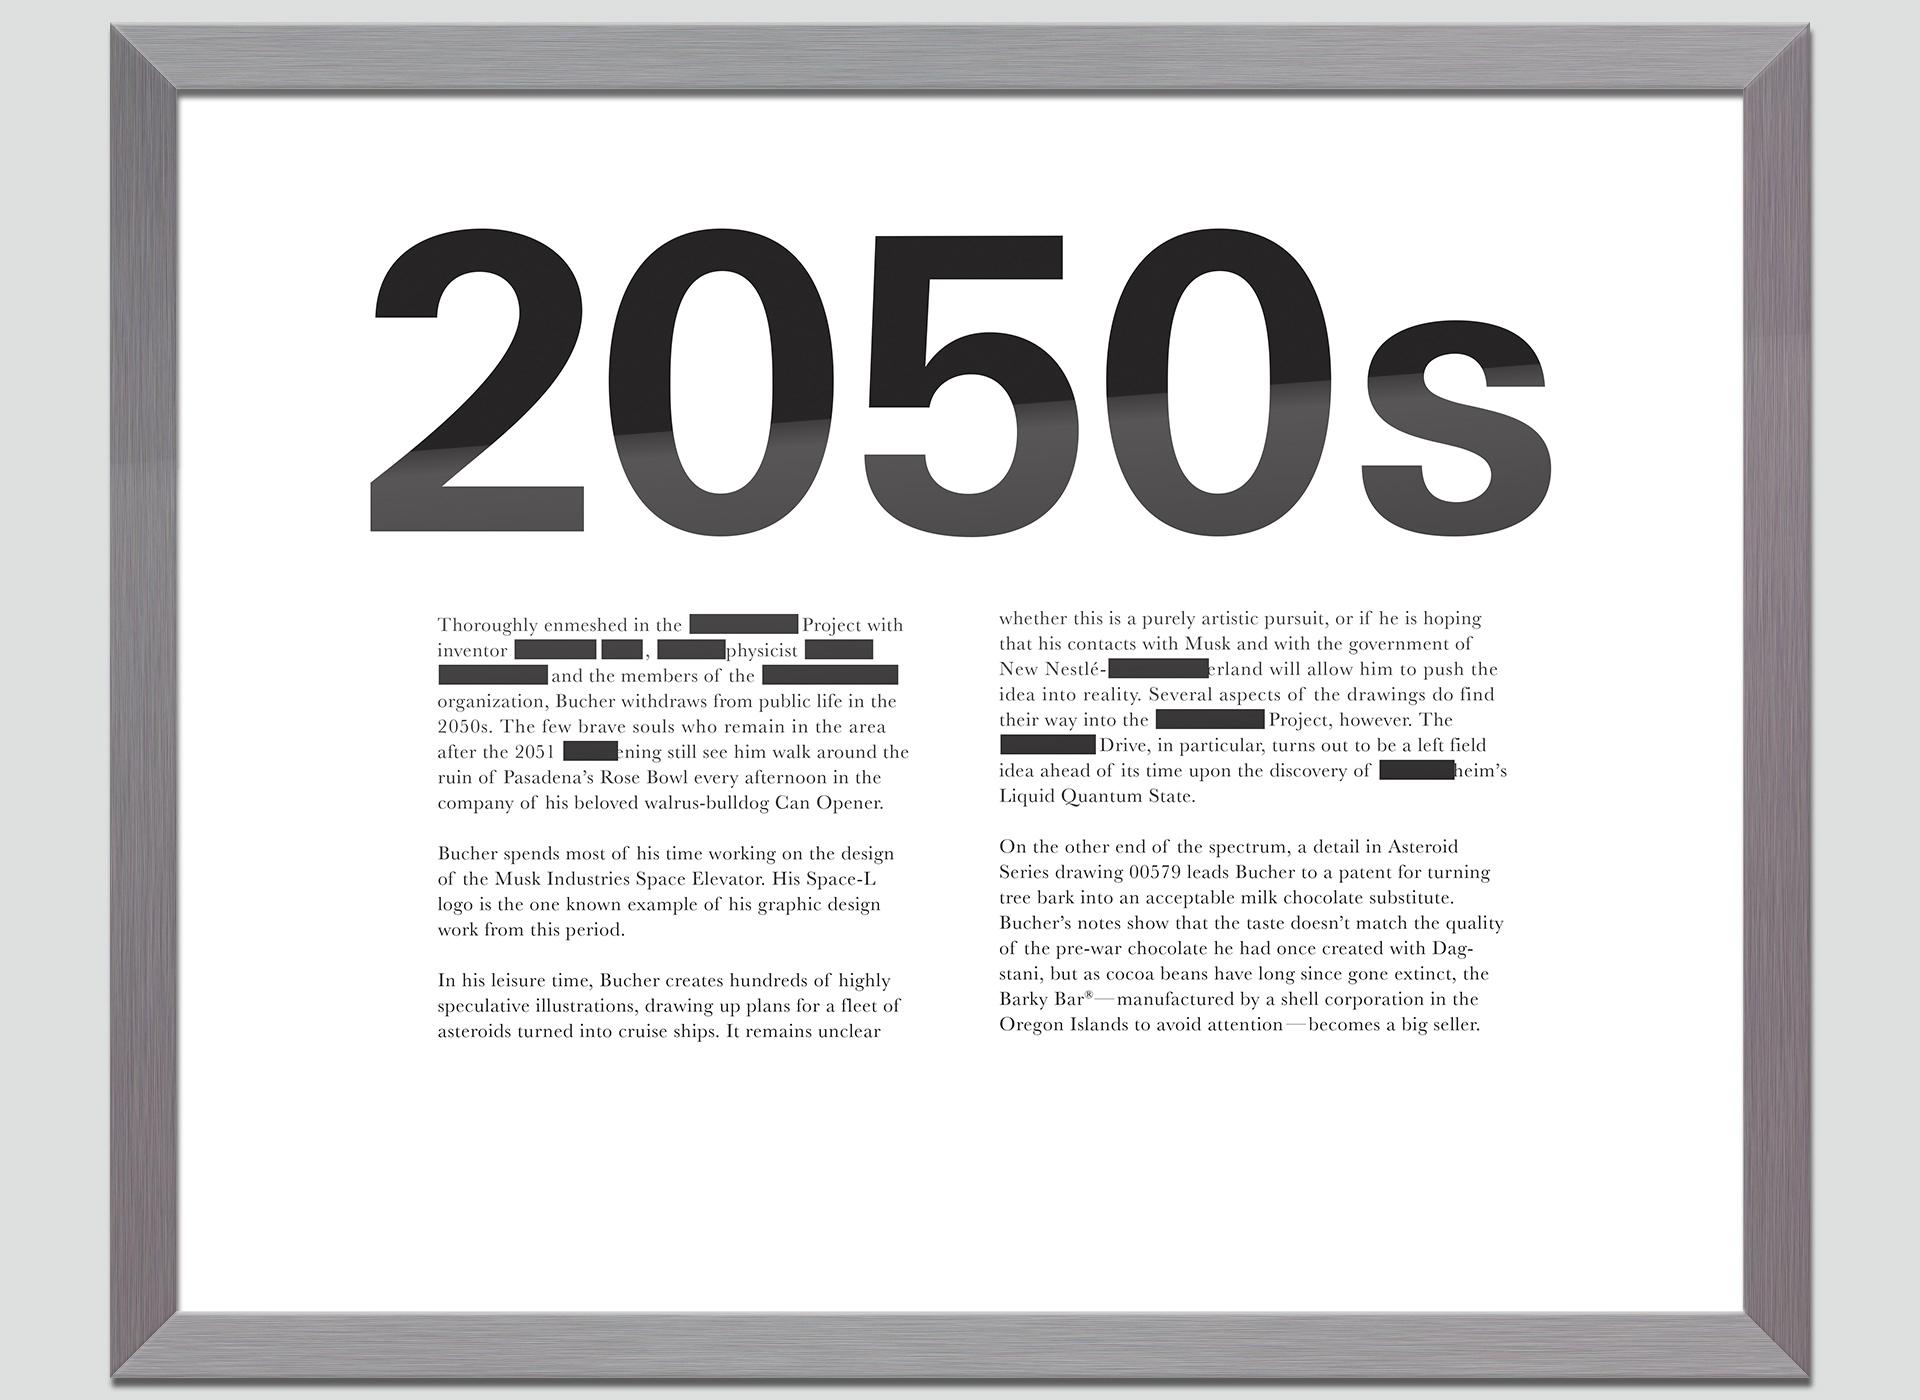 everything-decades-2050@2x.jpg